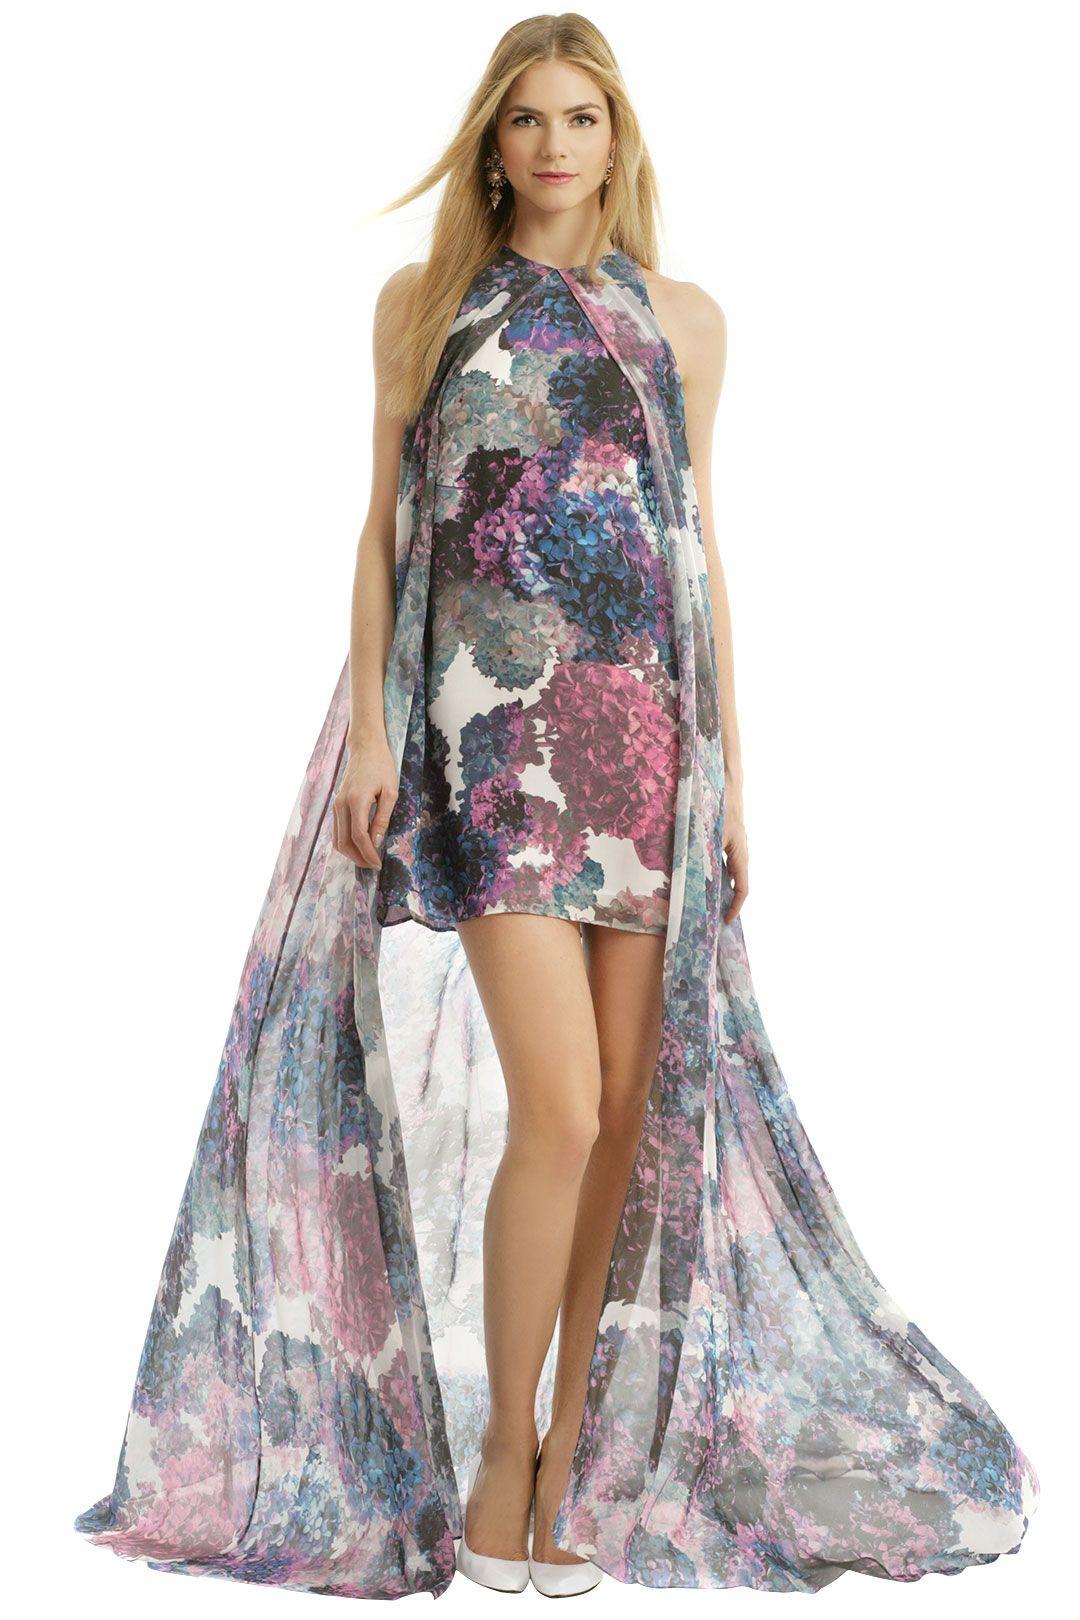 Floral maxi dress wedding  Considering this for beach wedding nha khanh Hydrangea Dream Maxi